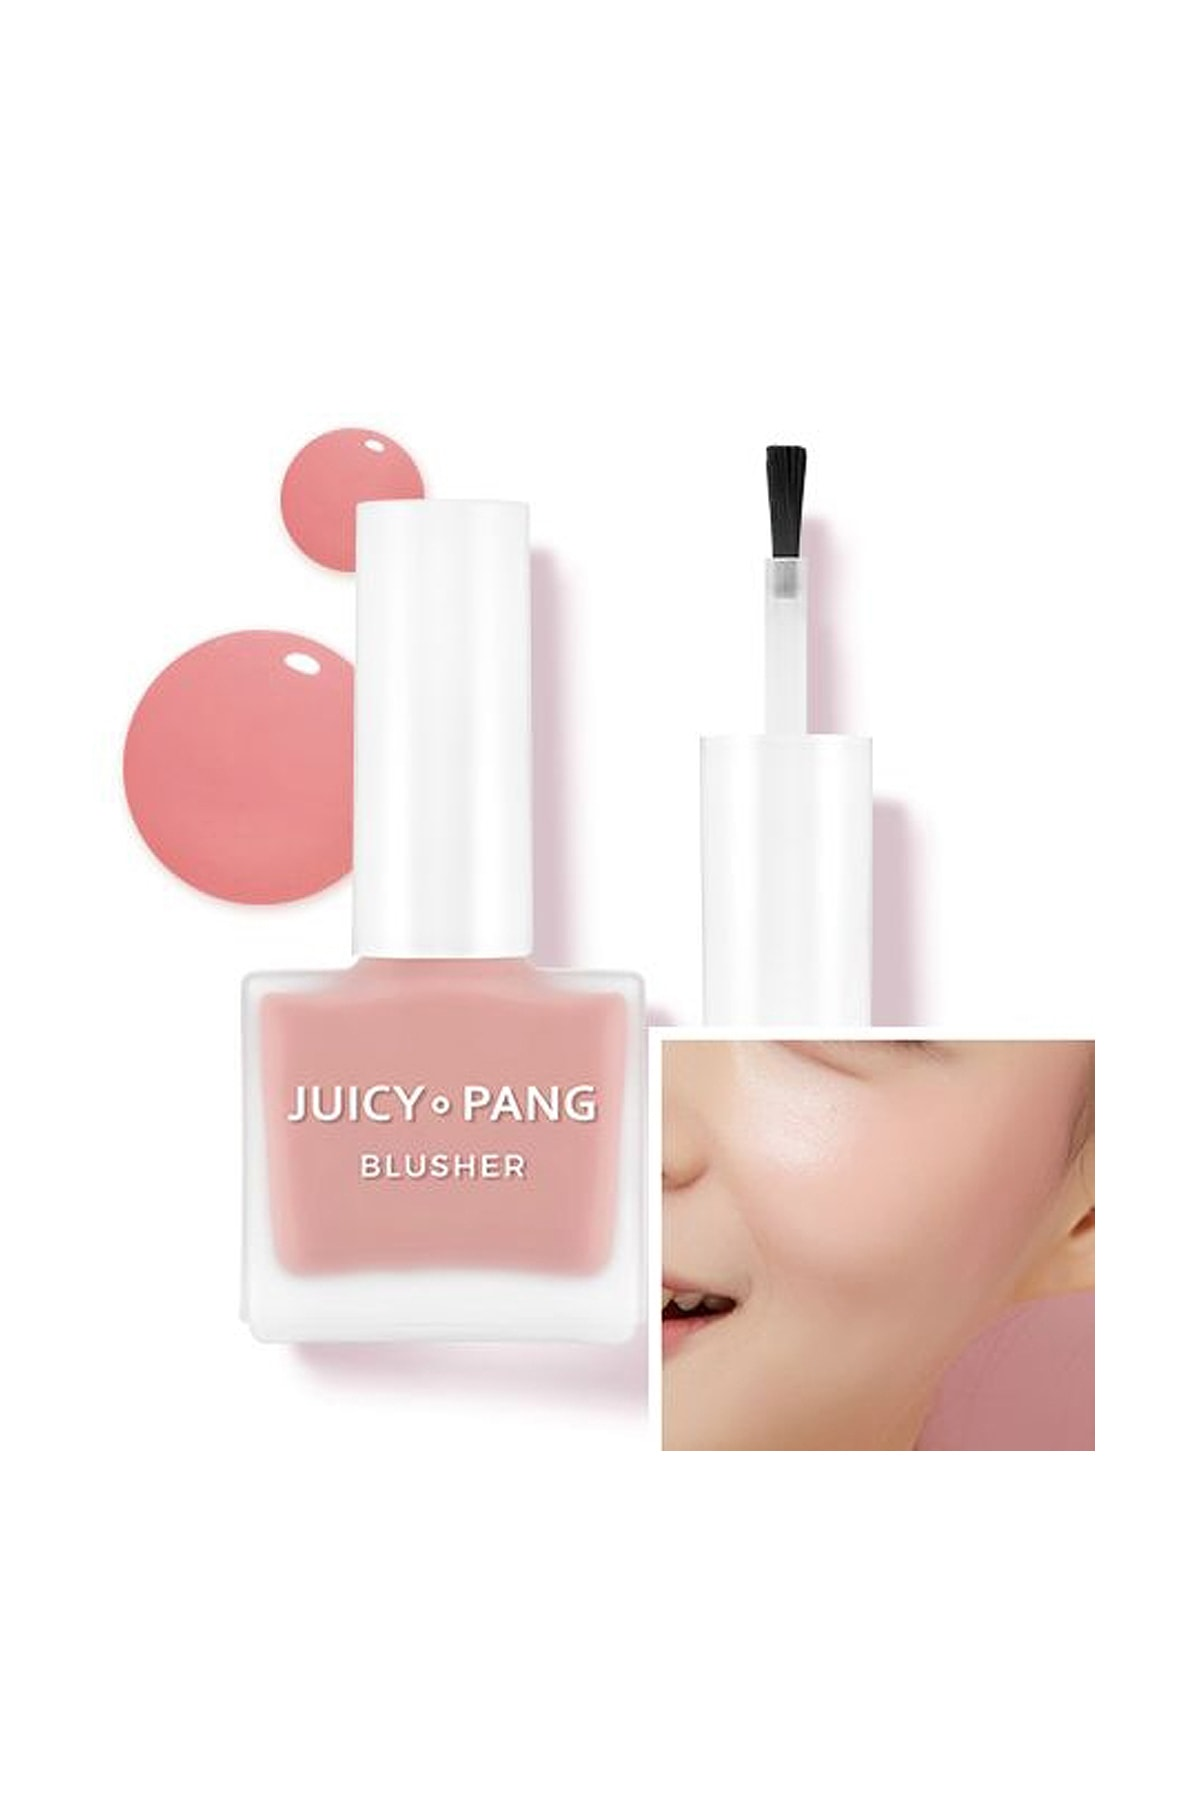 Missha Doğal Görünüm Sunan Nemlendirici Likit Allık 9g. APIEU Juicy-Pang Water Blusher (PK03) 0